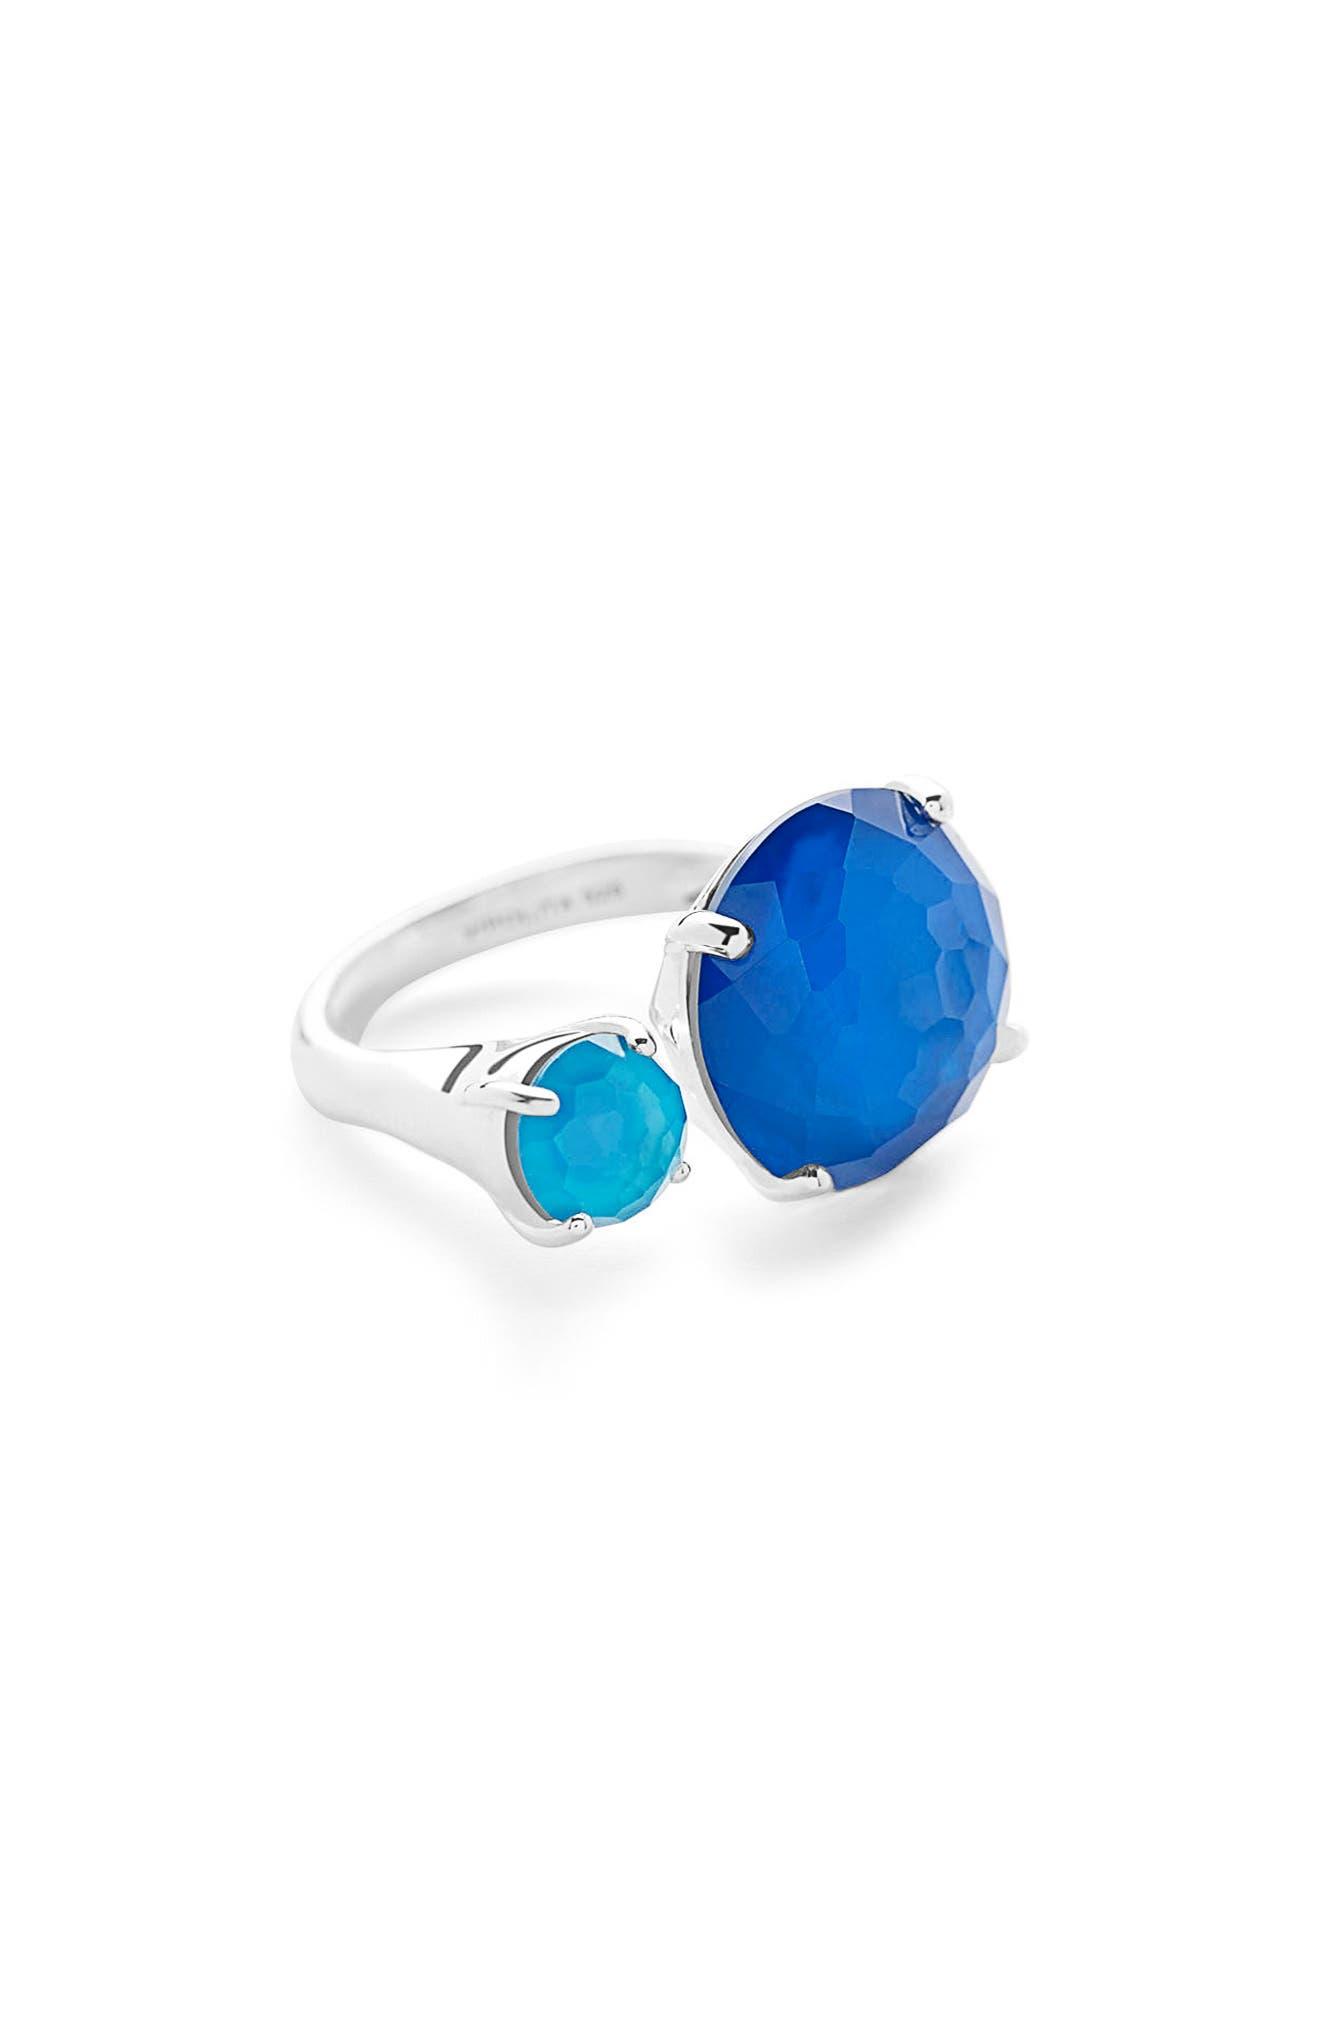 Wonderland Stone Ring,                             Main thumbnail 1, color,                             Blue